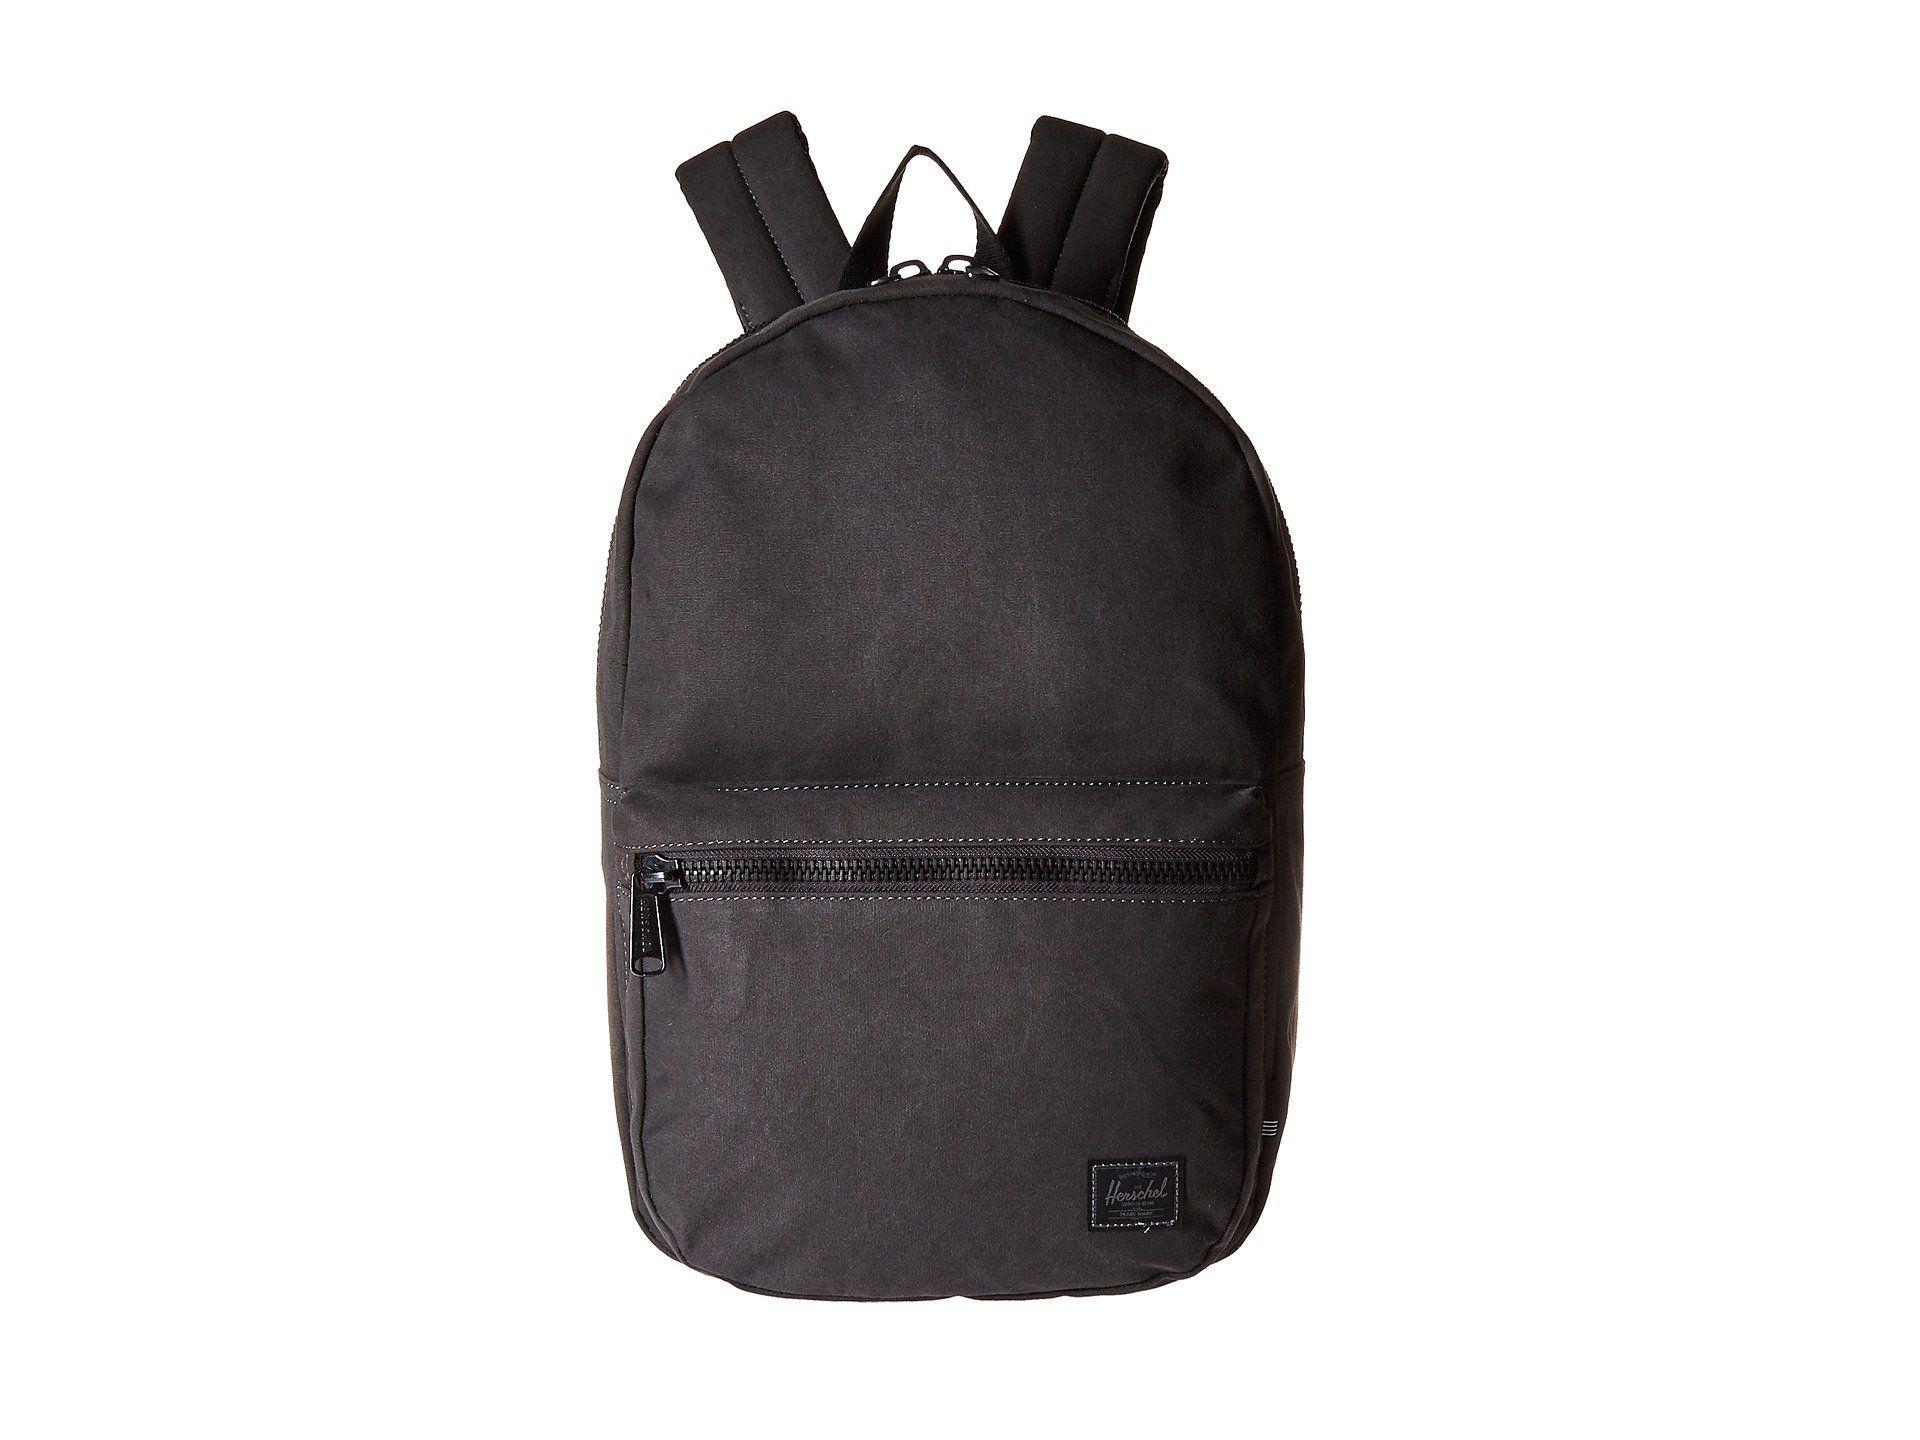 af758d2f98 HERSCHEL SUPPLY CO. Lawson.  herschelsupplyco.  bags  leather  nylon   backpacks